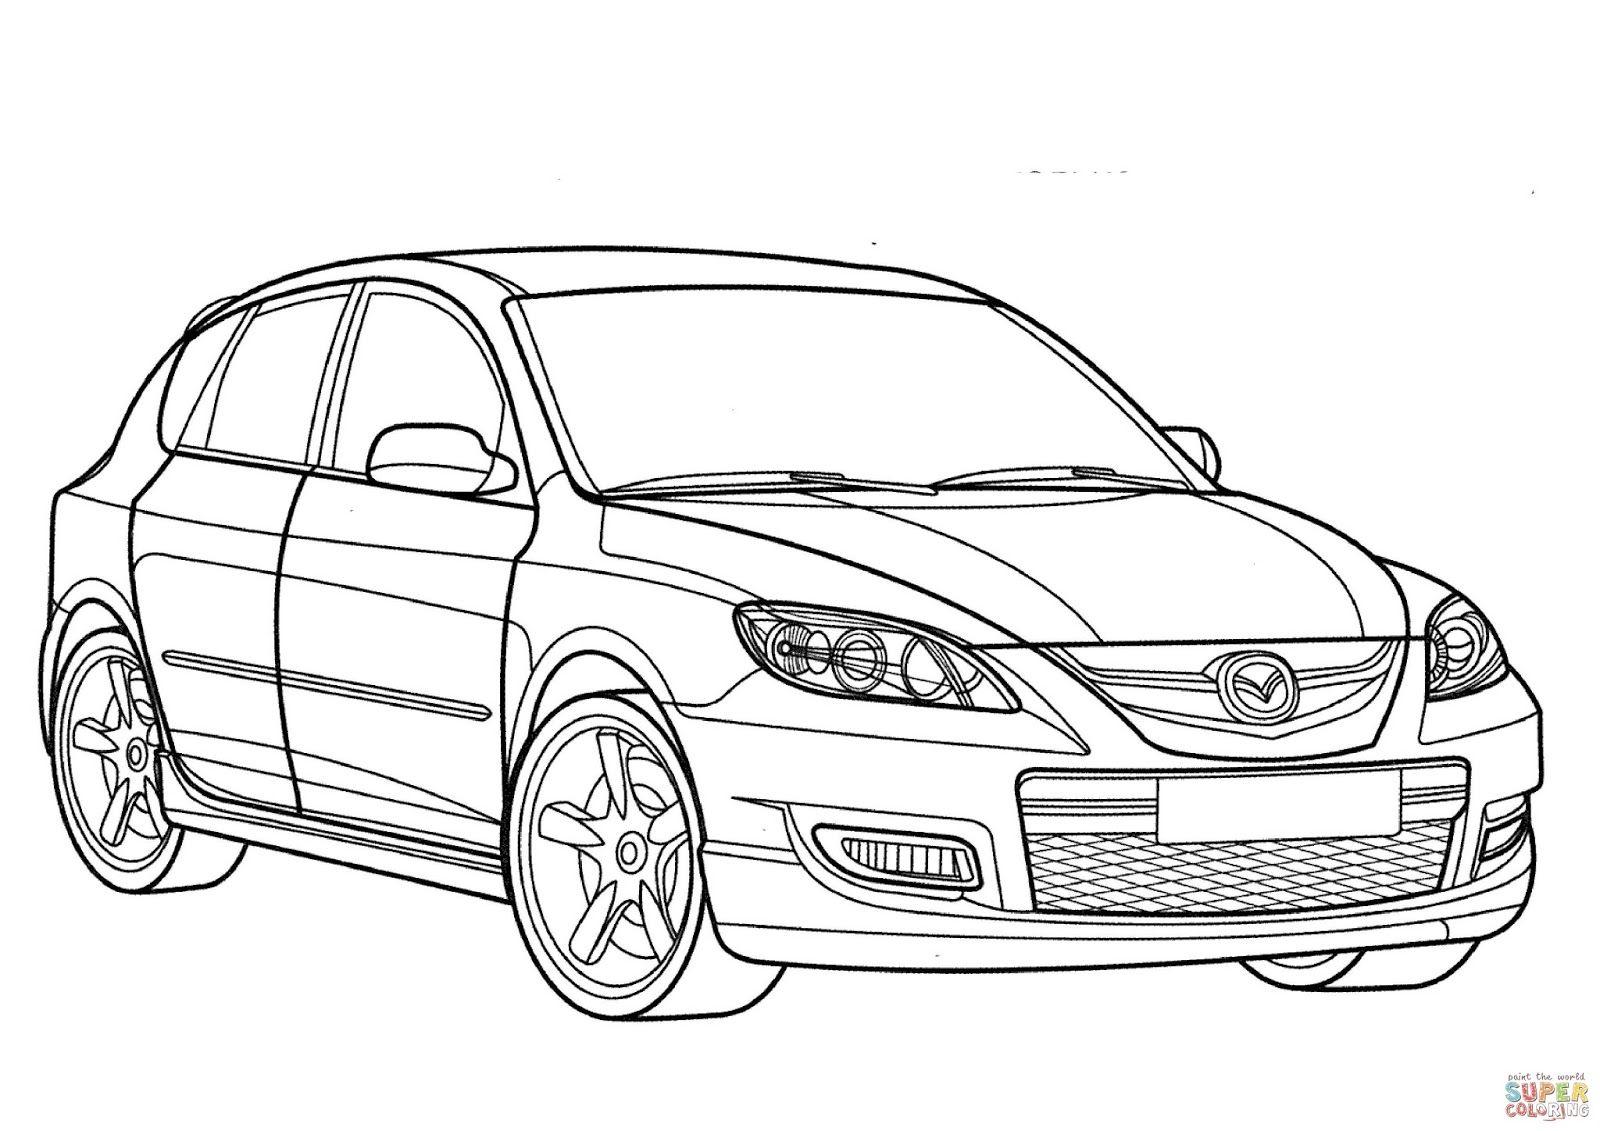 10 mewarnai gambar mobil sedan bonikids autos dibujos